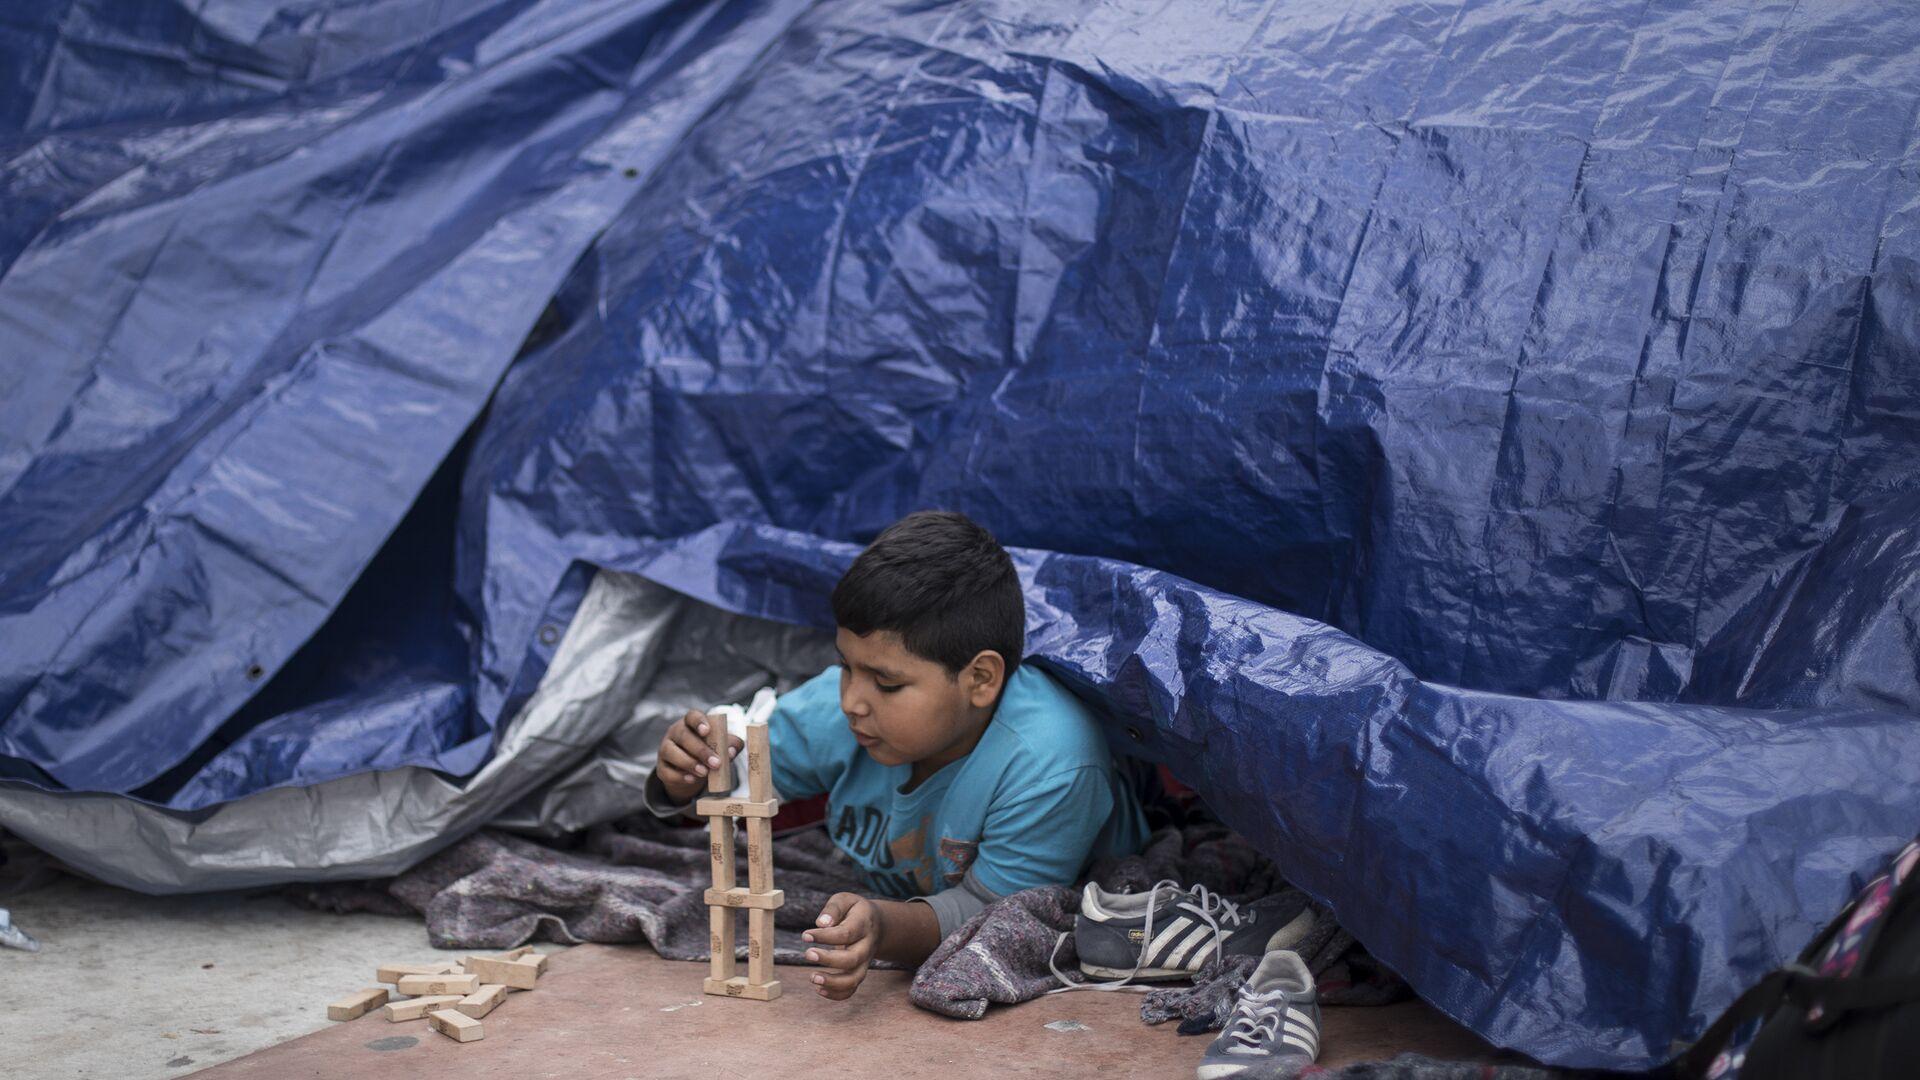 Niños migrantes en México - Sputnik Mundo, 1920, 23.03.2021